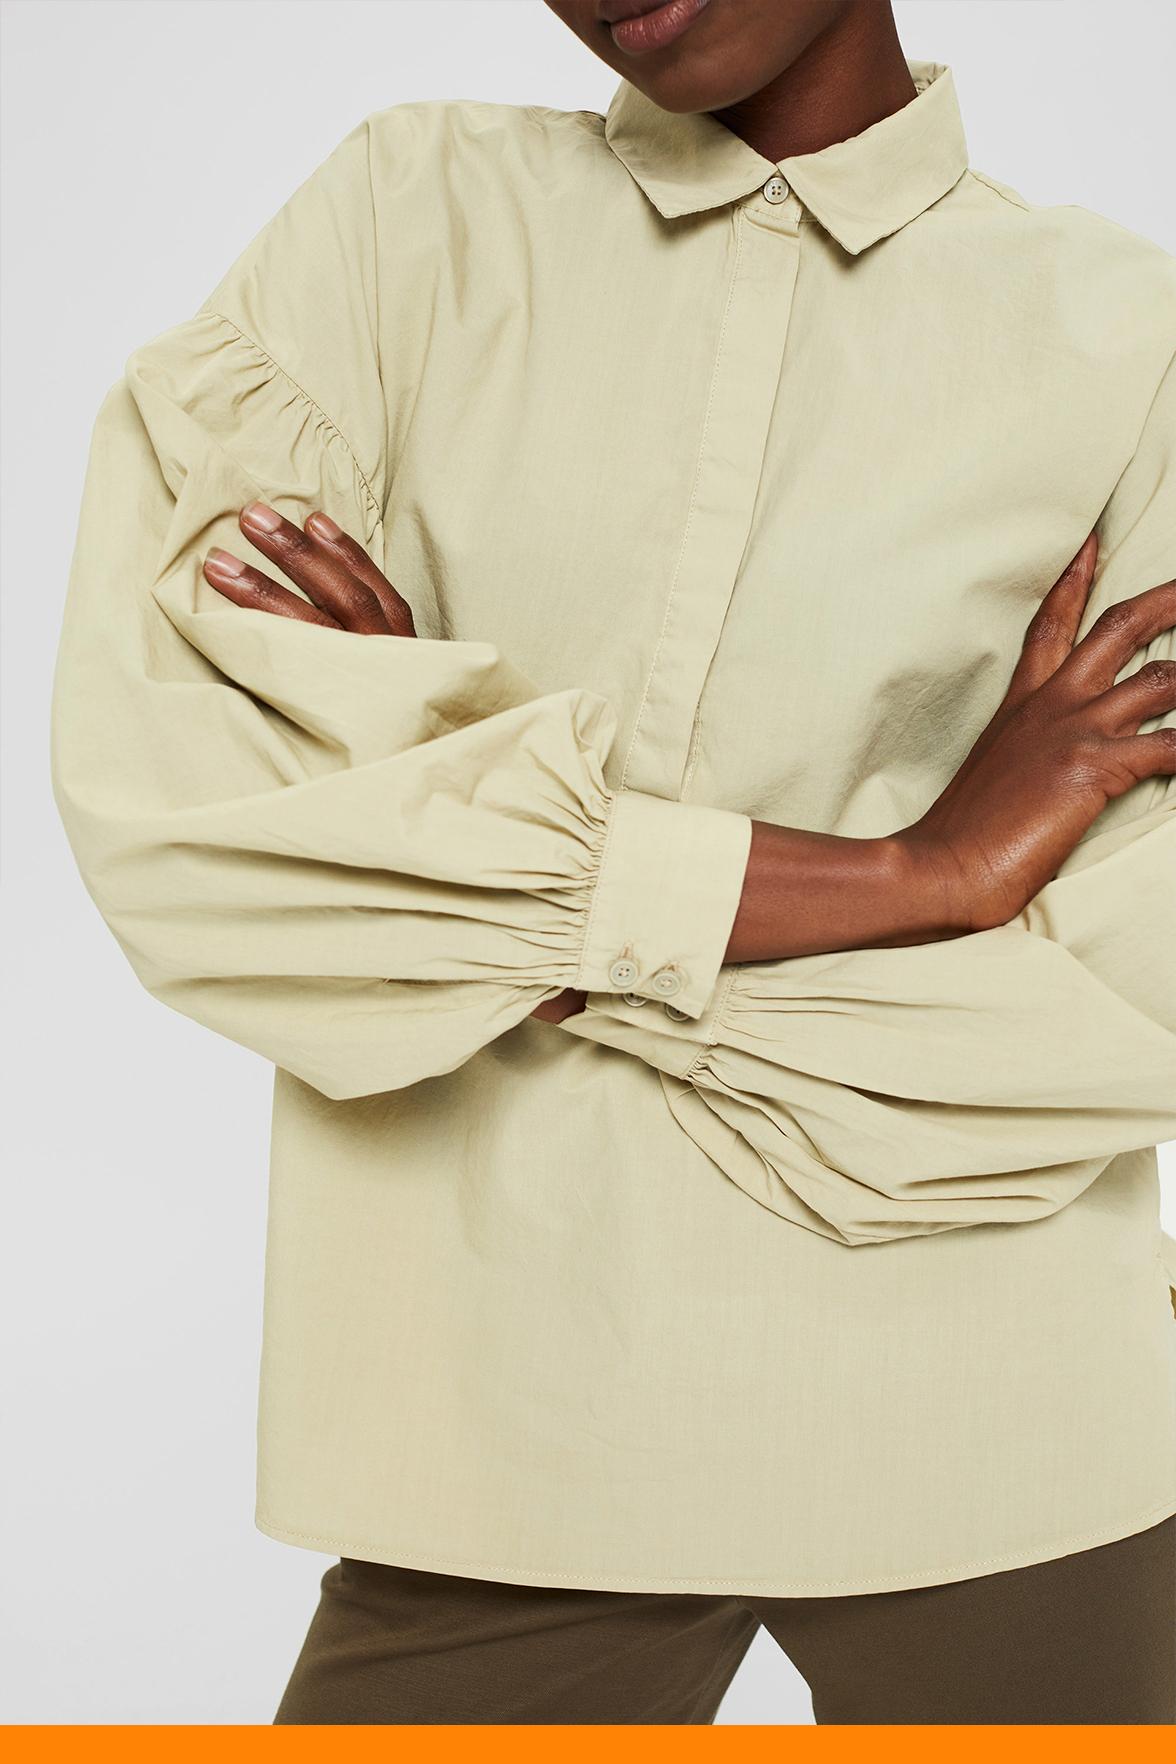 412021 - Sale - startpage - tile banner 8 - women blusen - IMG